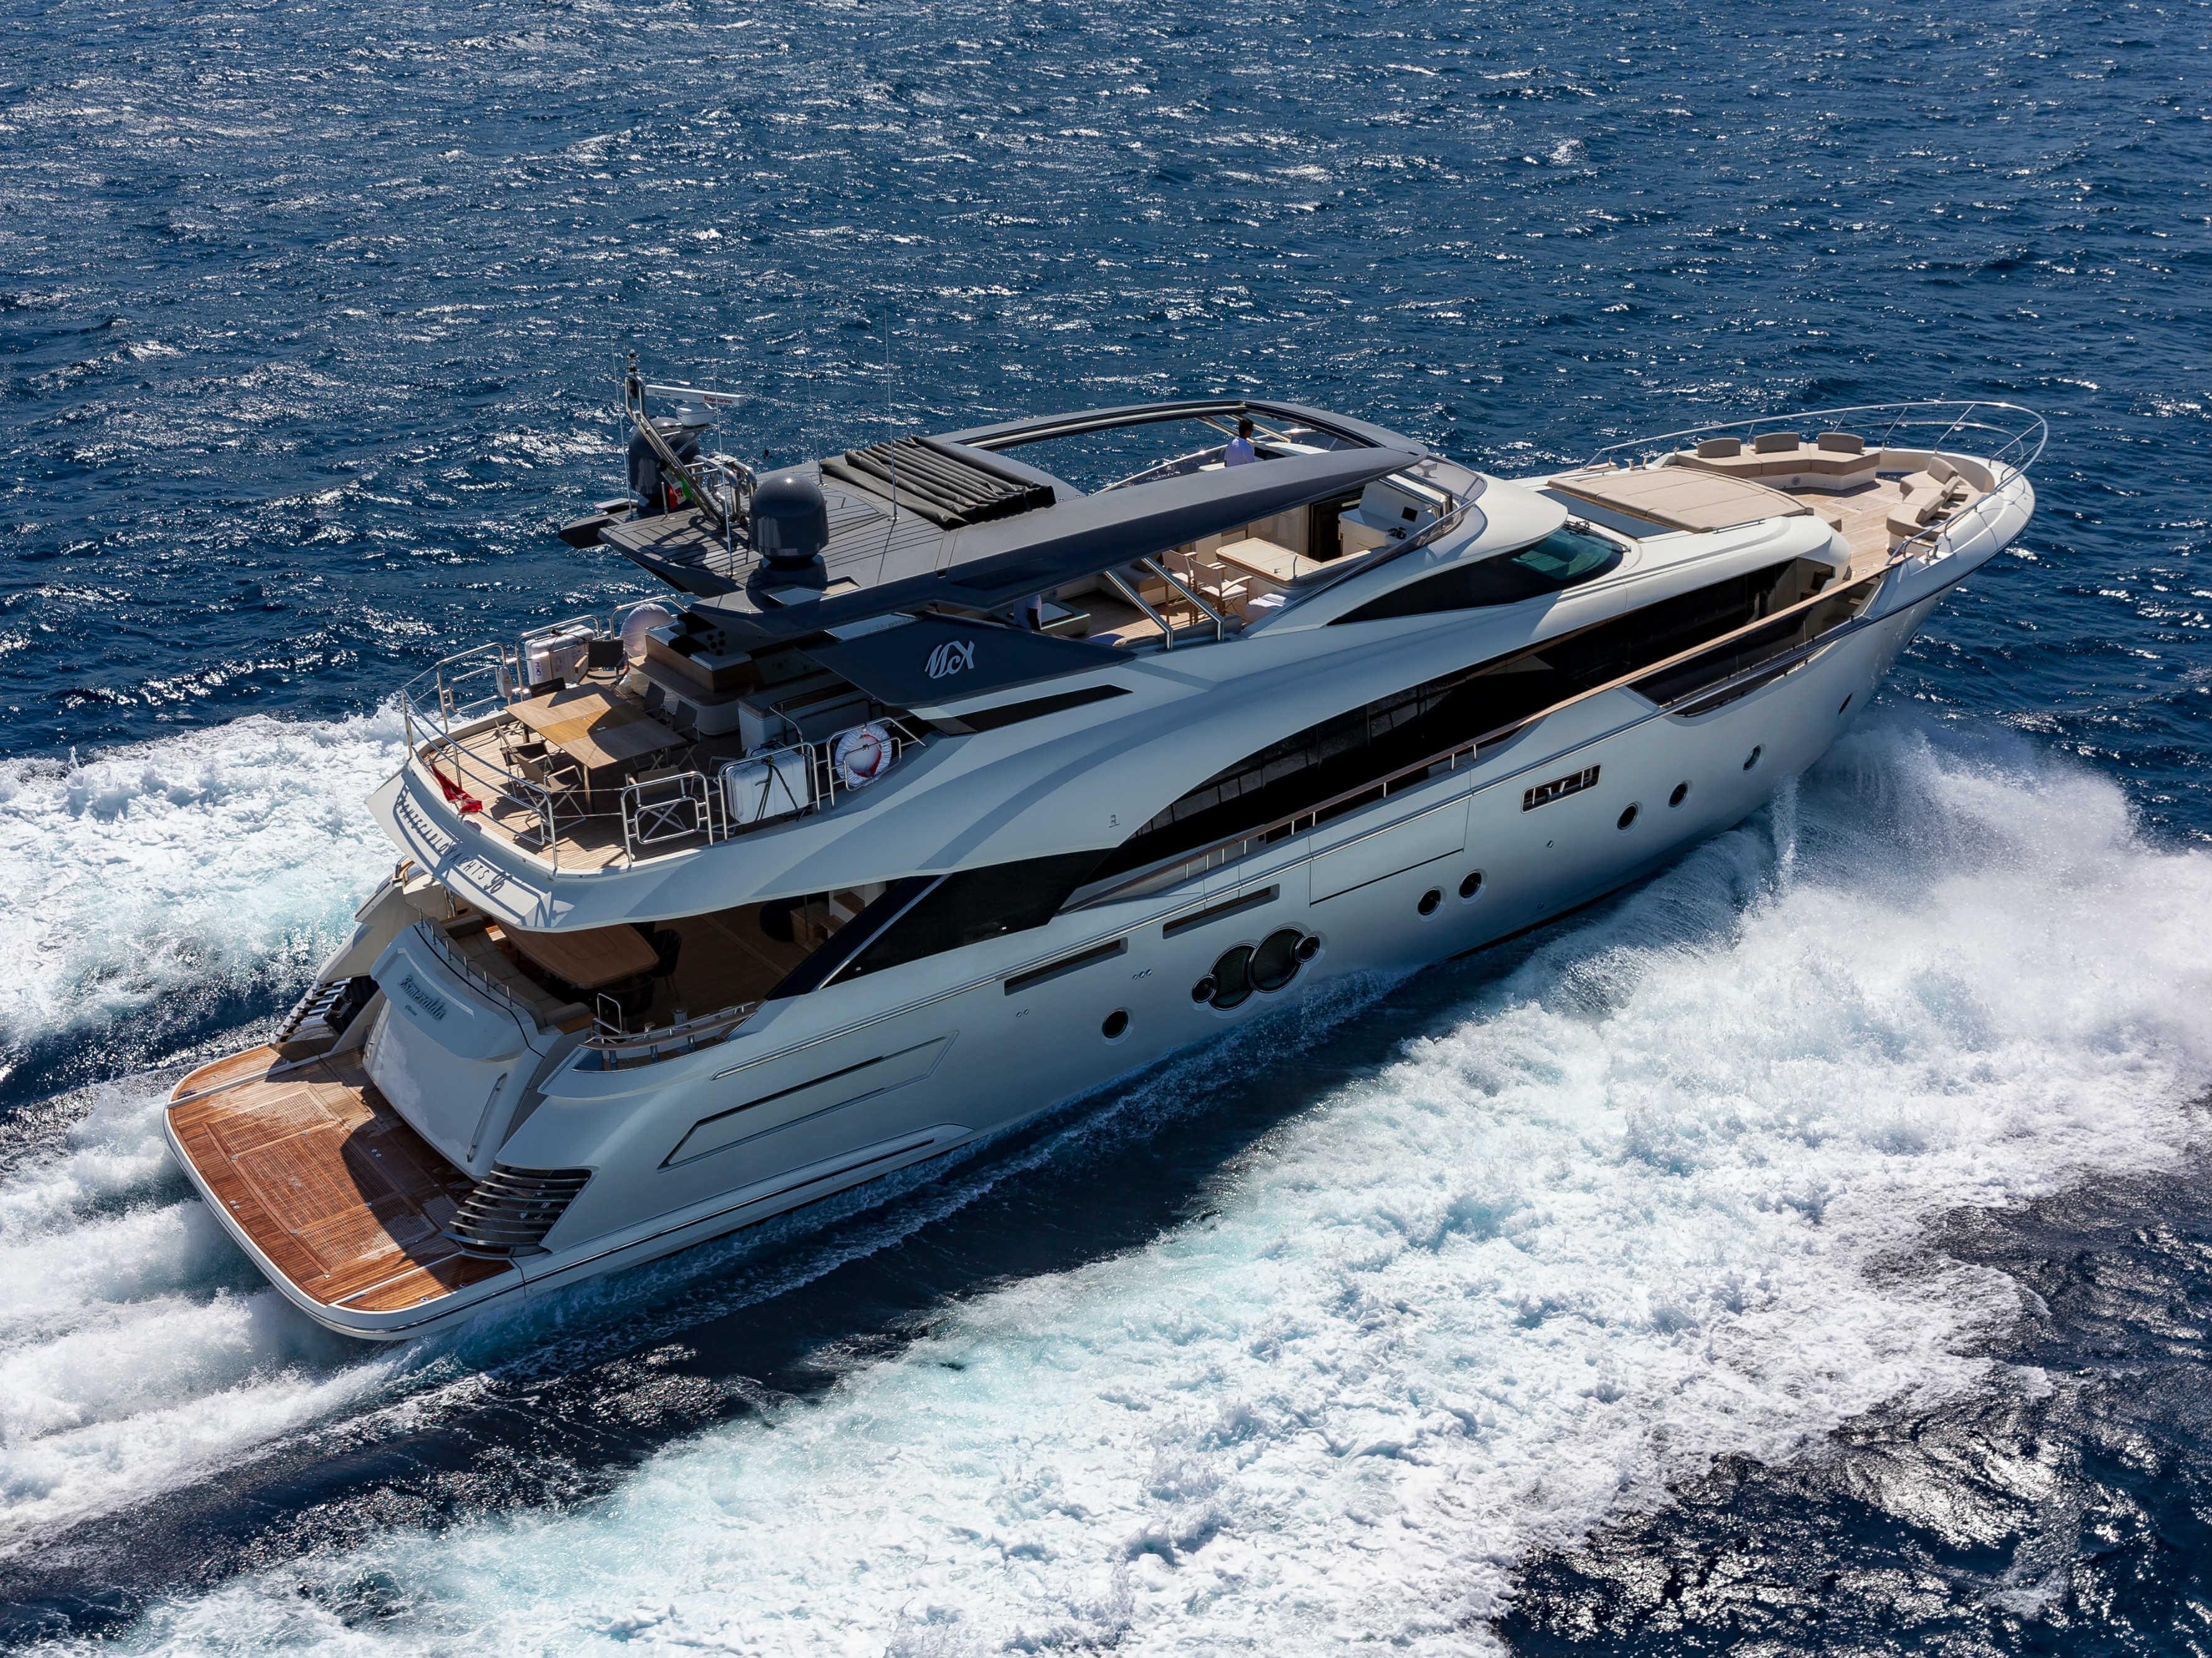 2017_montecarloyacht961564412466.jpg